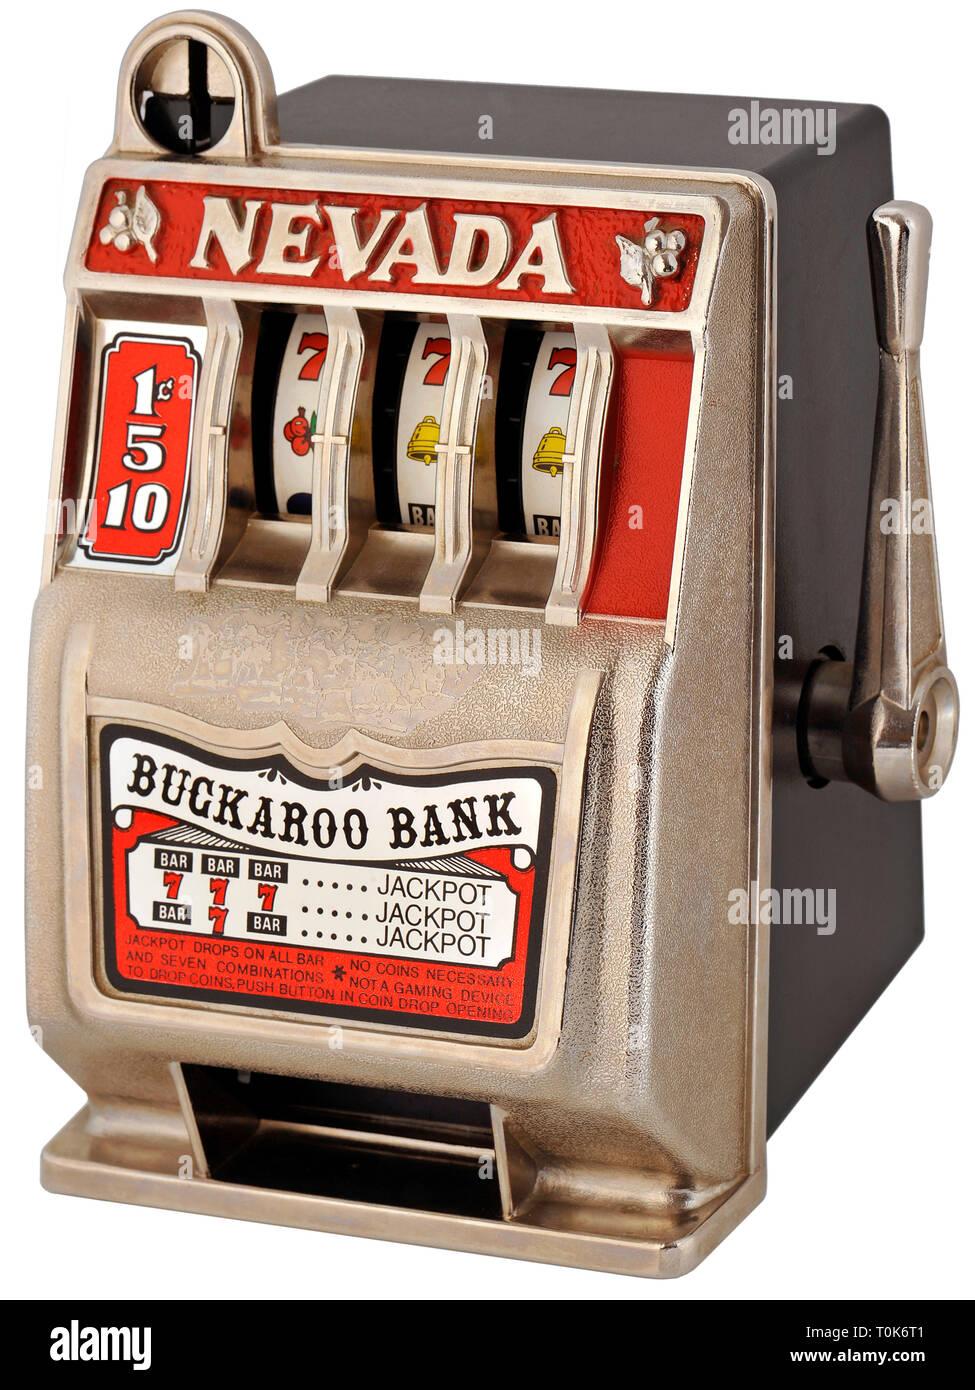 Giochi, macchina da gioco, uno-armati bandit, slot machines, Hongkong, circa 1985, Additional-Rights-Clearance-Info-Not-Available Immagini Stock